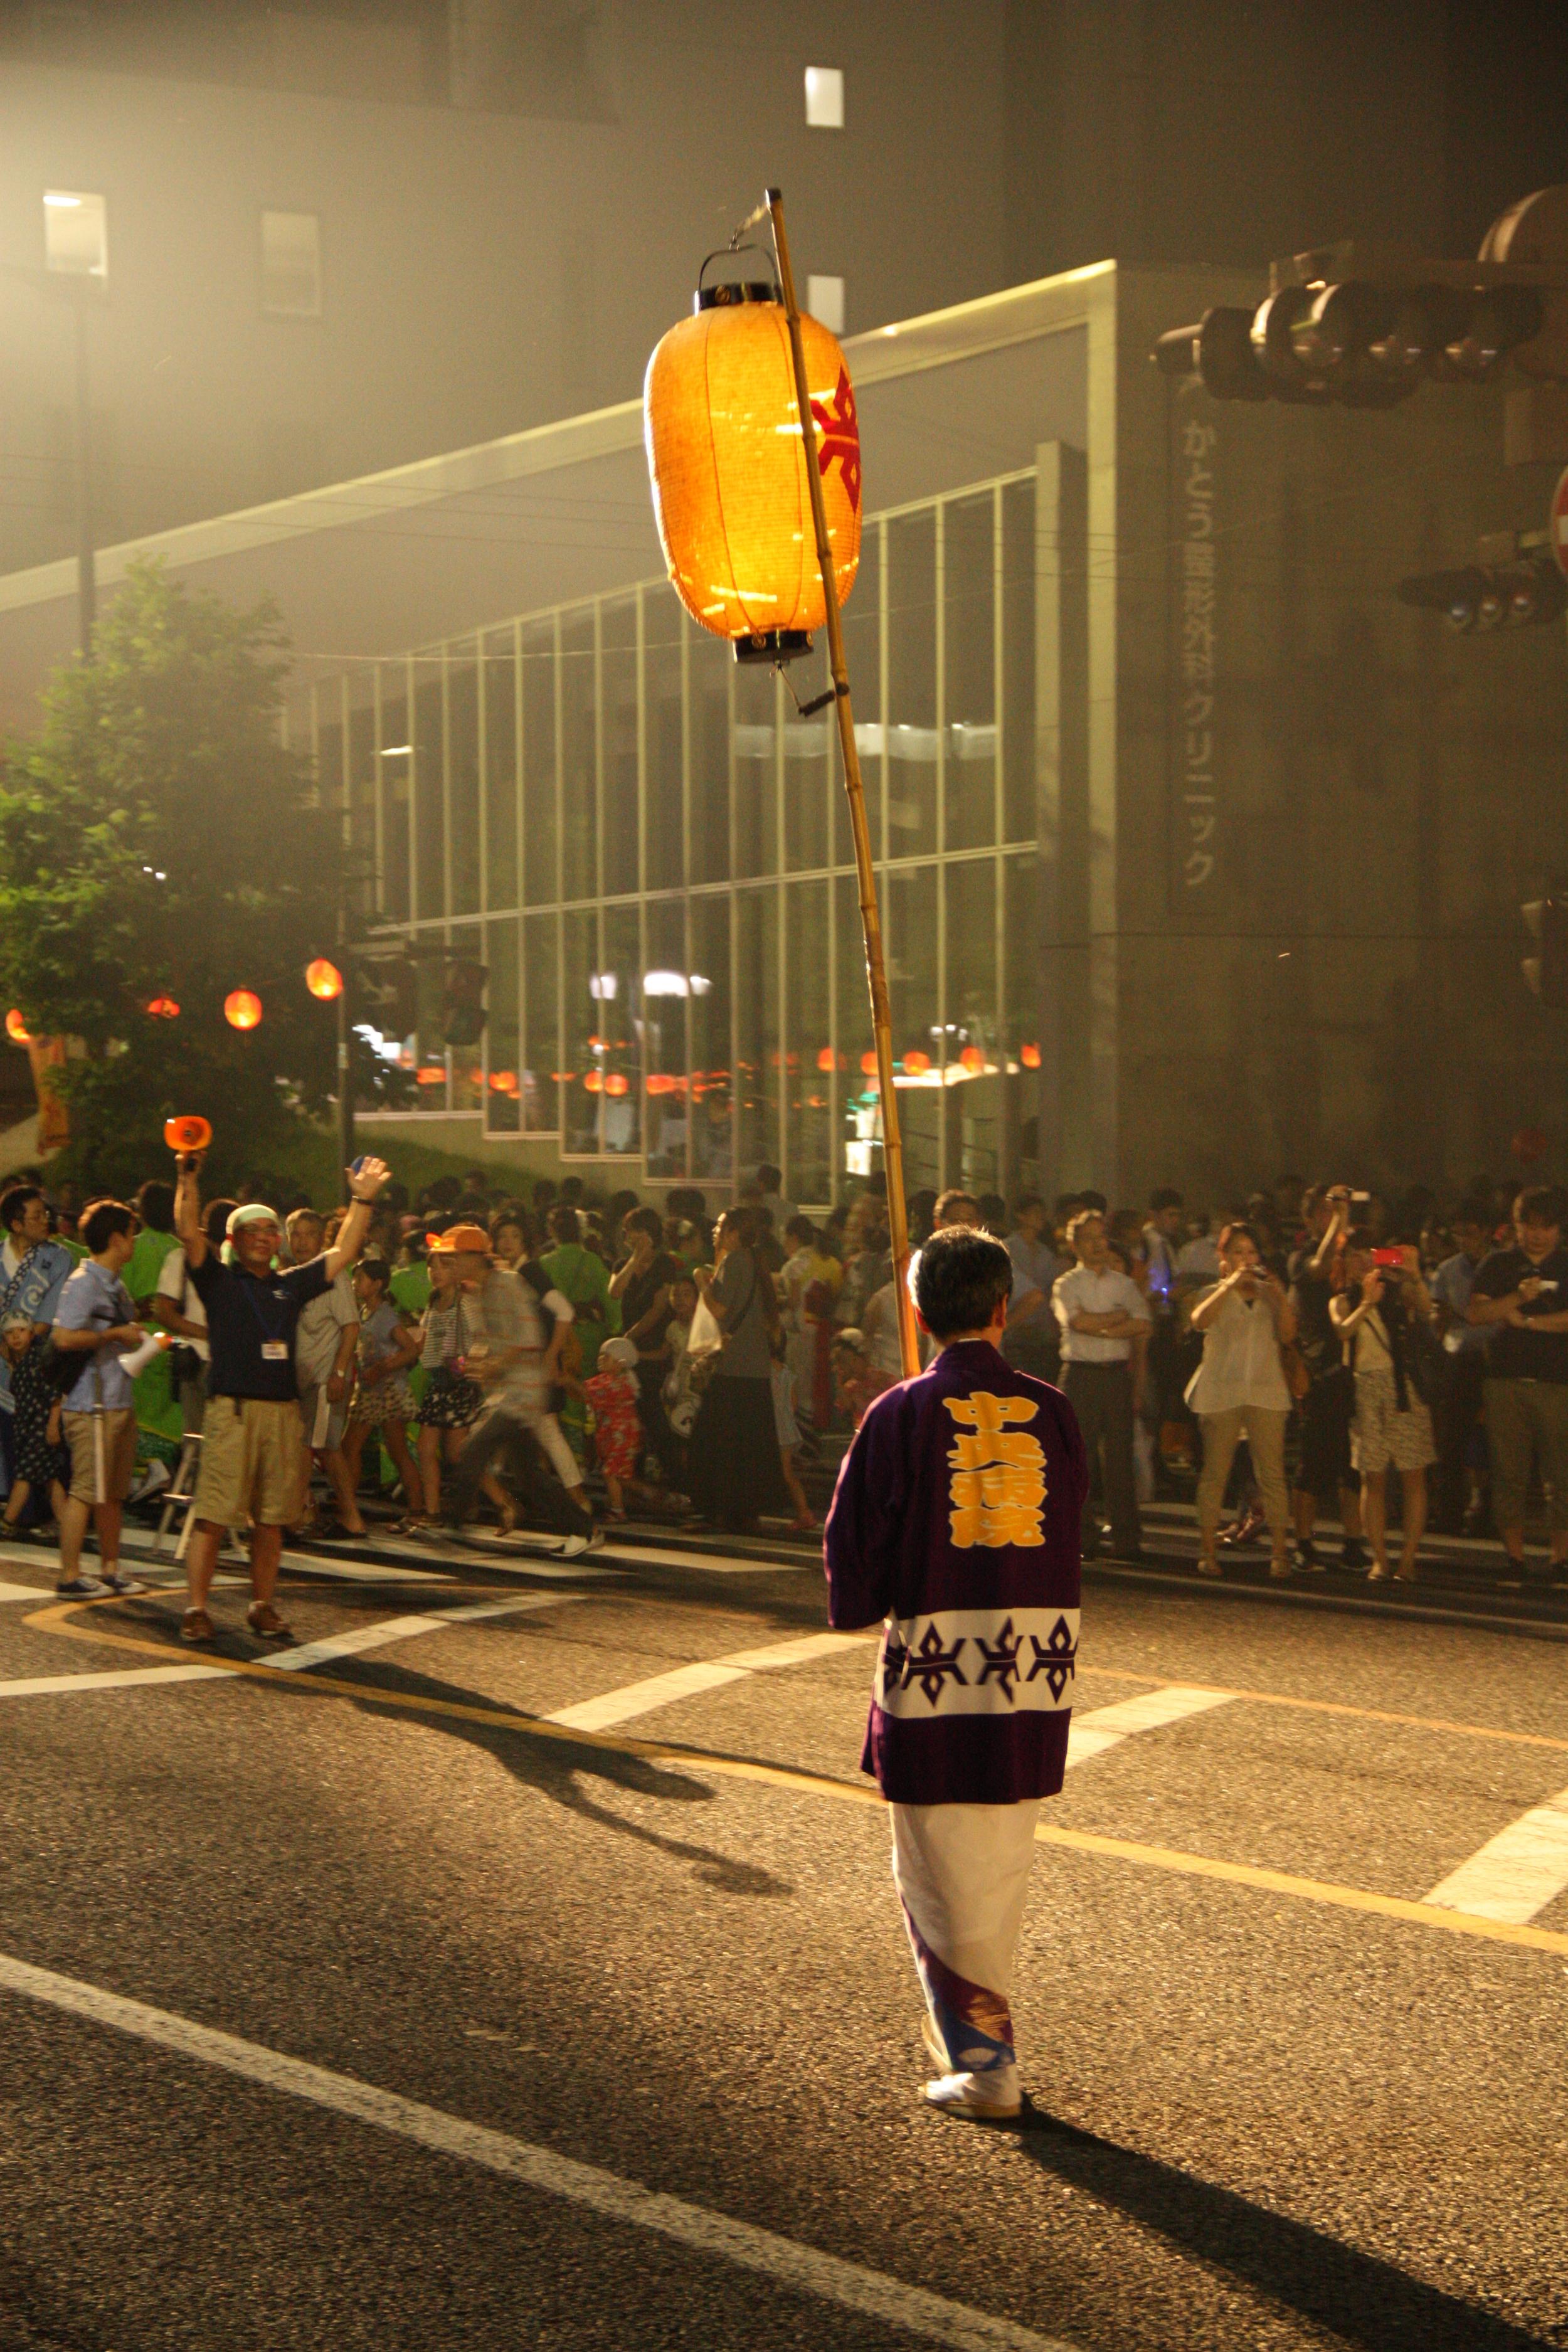 Festival - Sansa Odori - Pole Lantern - IMG_8411.JPG